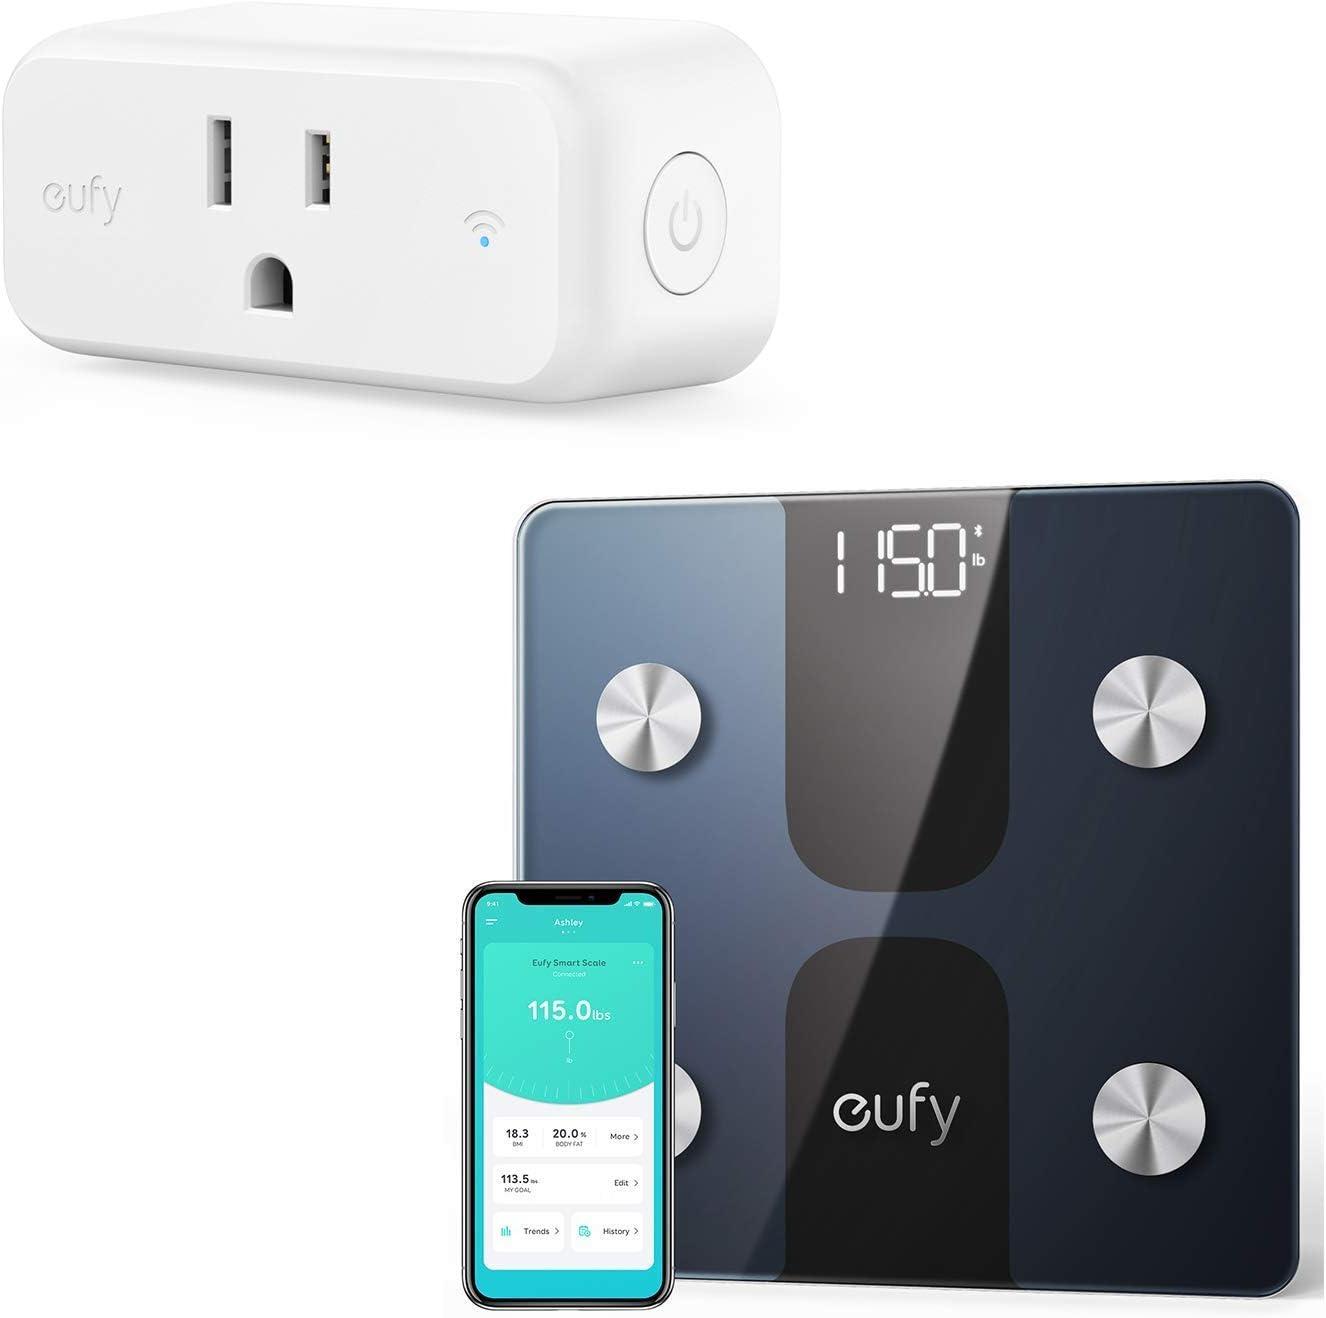 eufy Smart Scale C1 | eufy by Anker, Smart Plug Mini